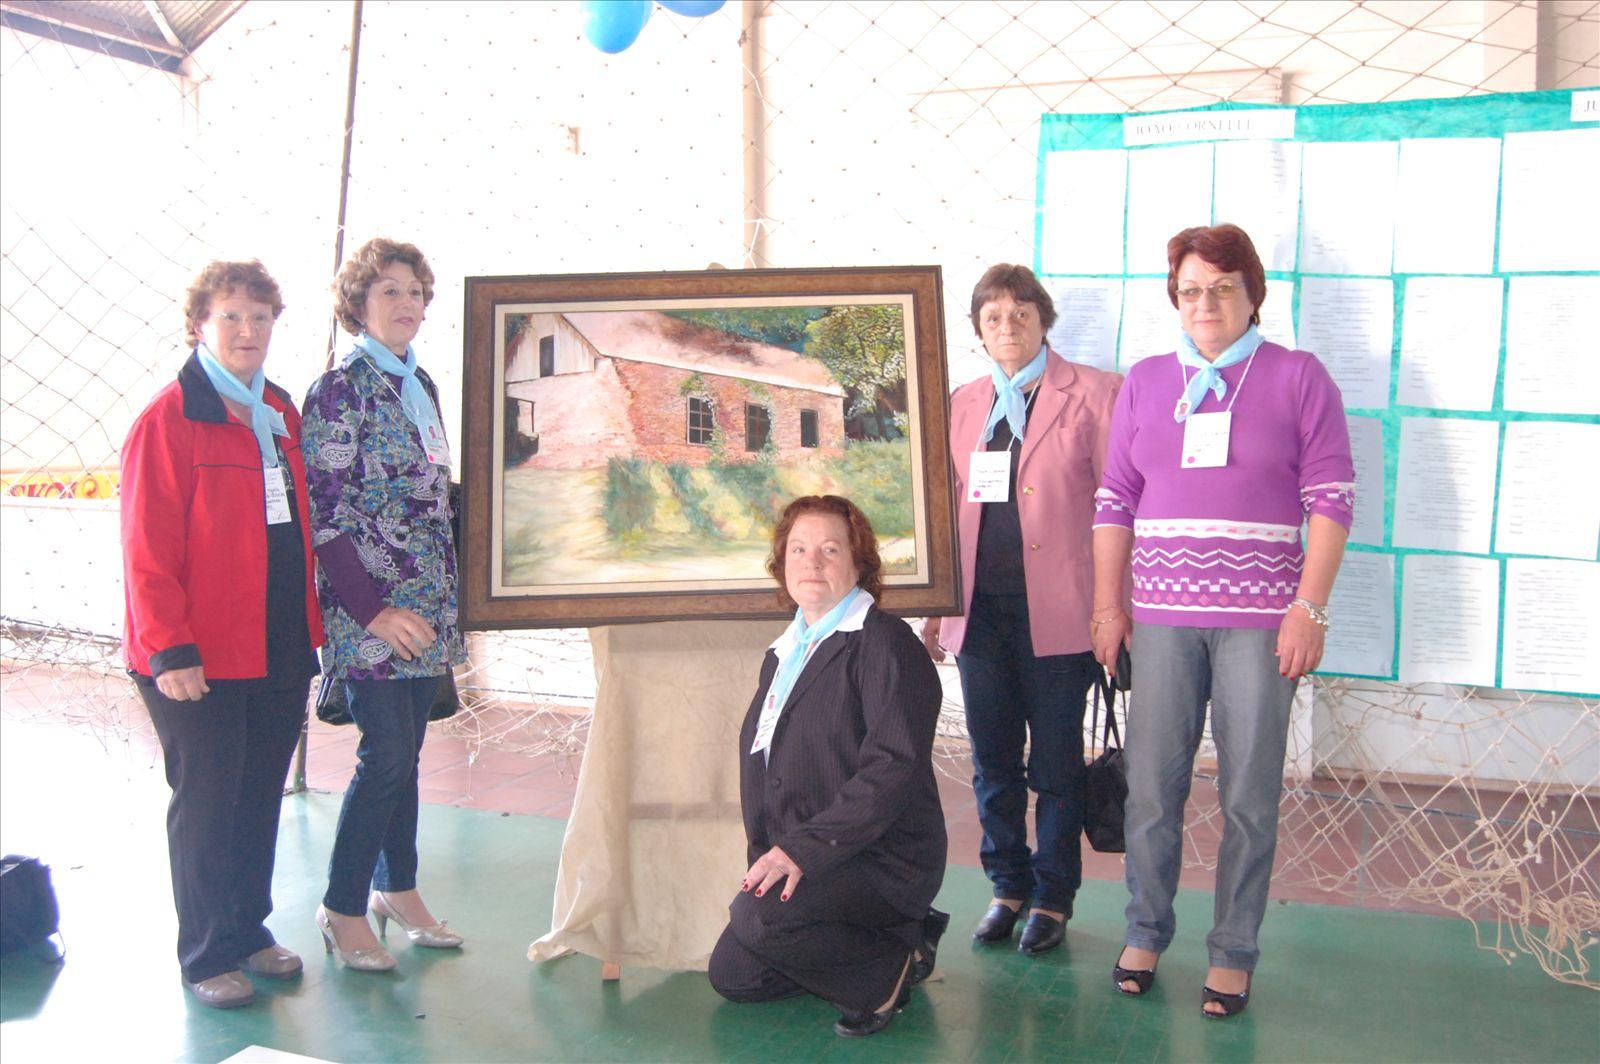 2º Encontro Família Cornelli - 11.10.2009 (11)_0